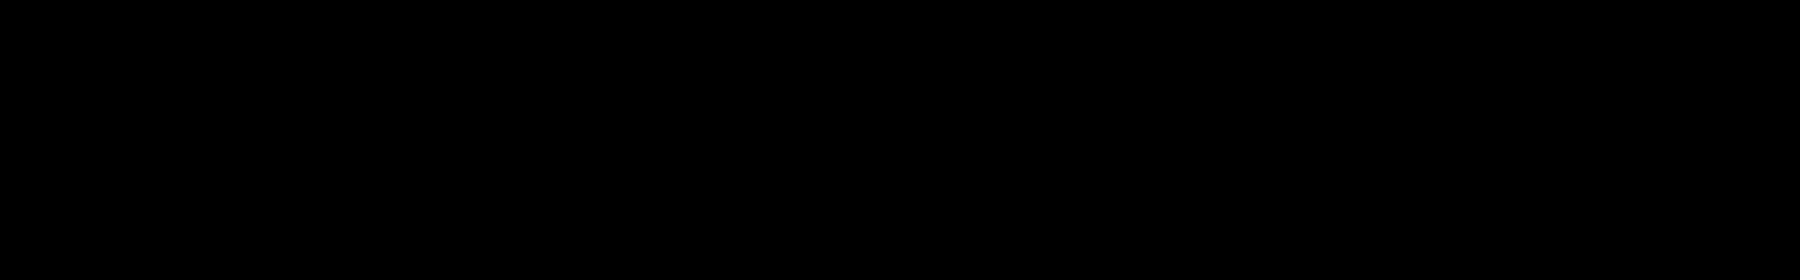 MSMRZ audio waveform